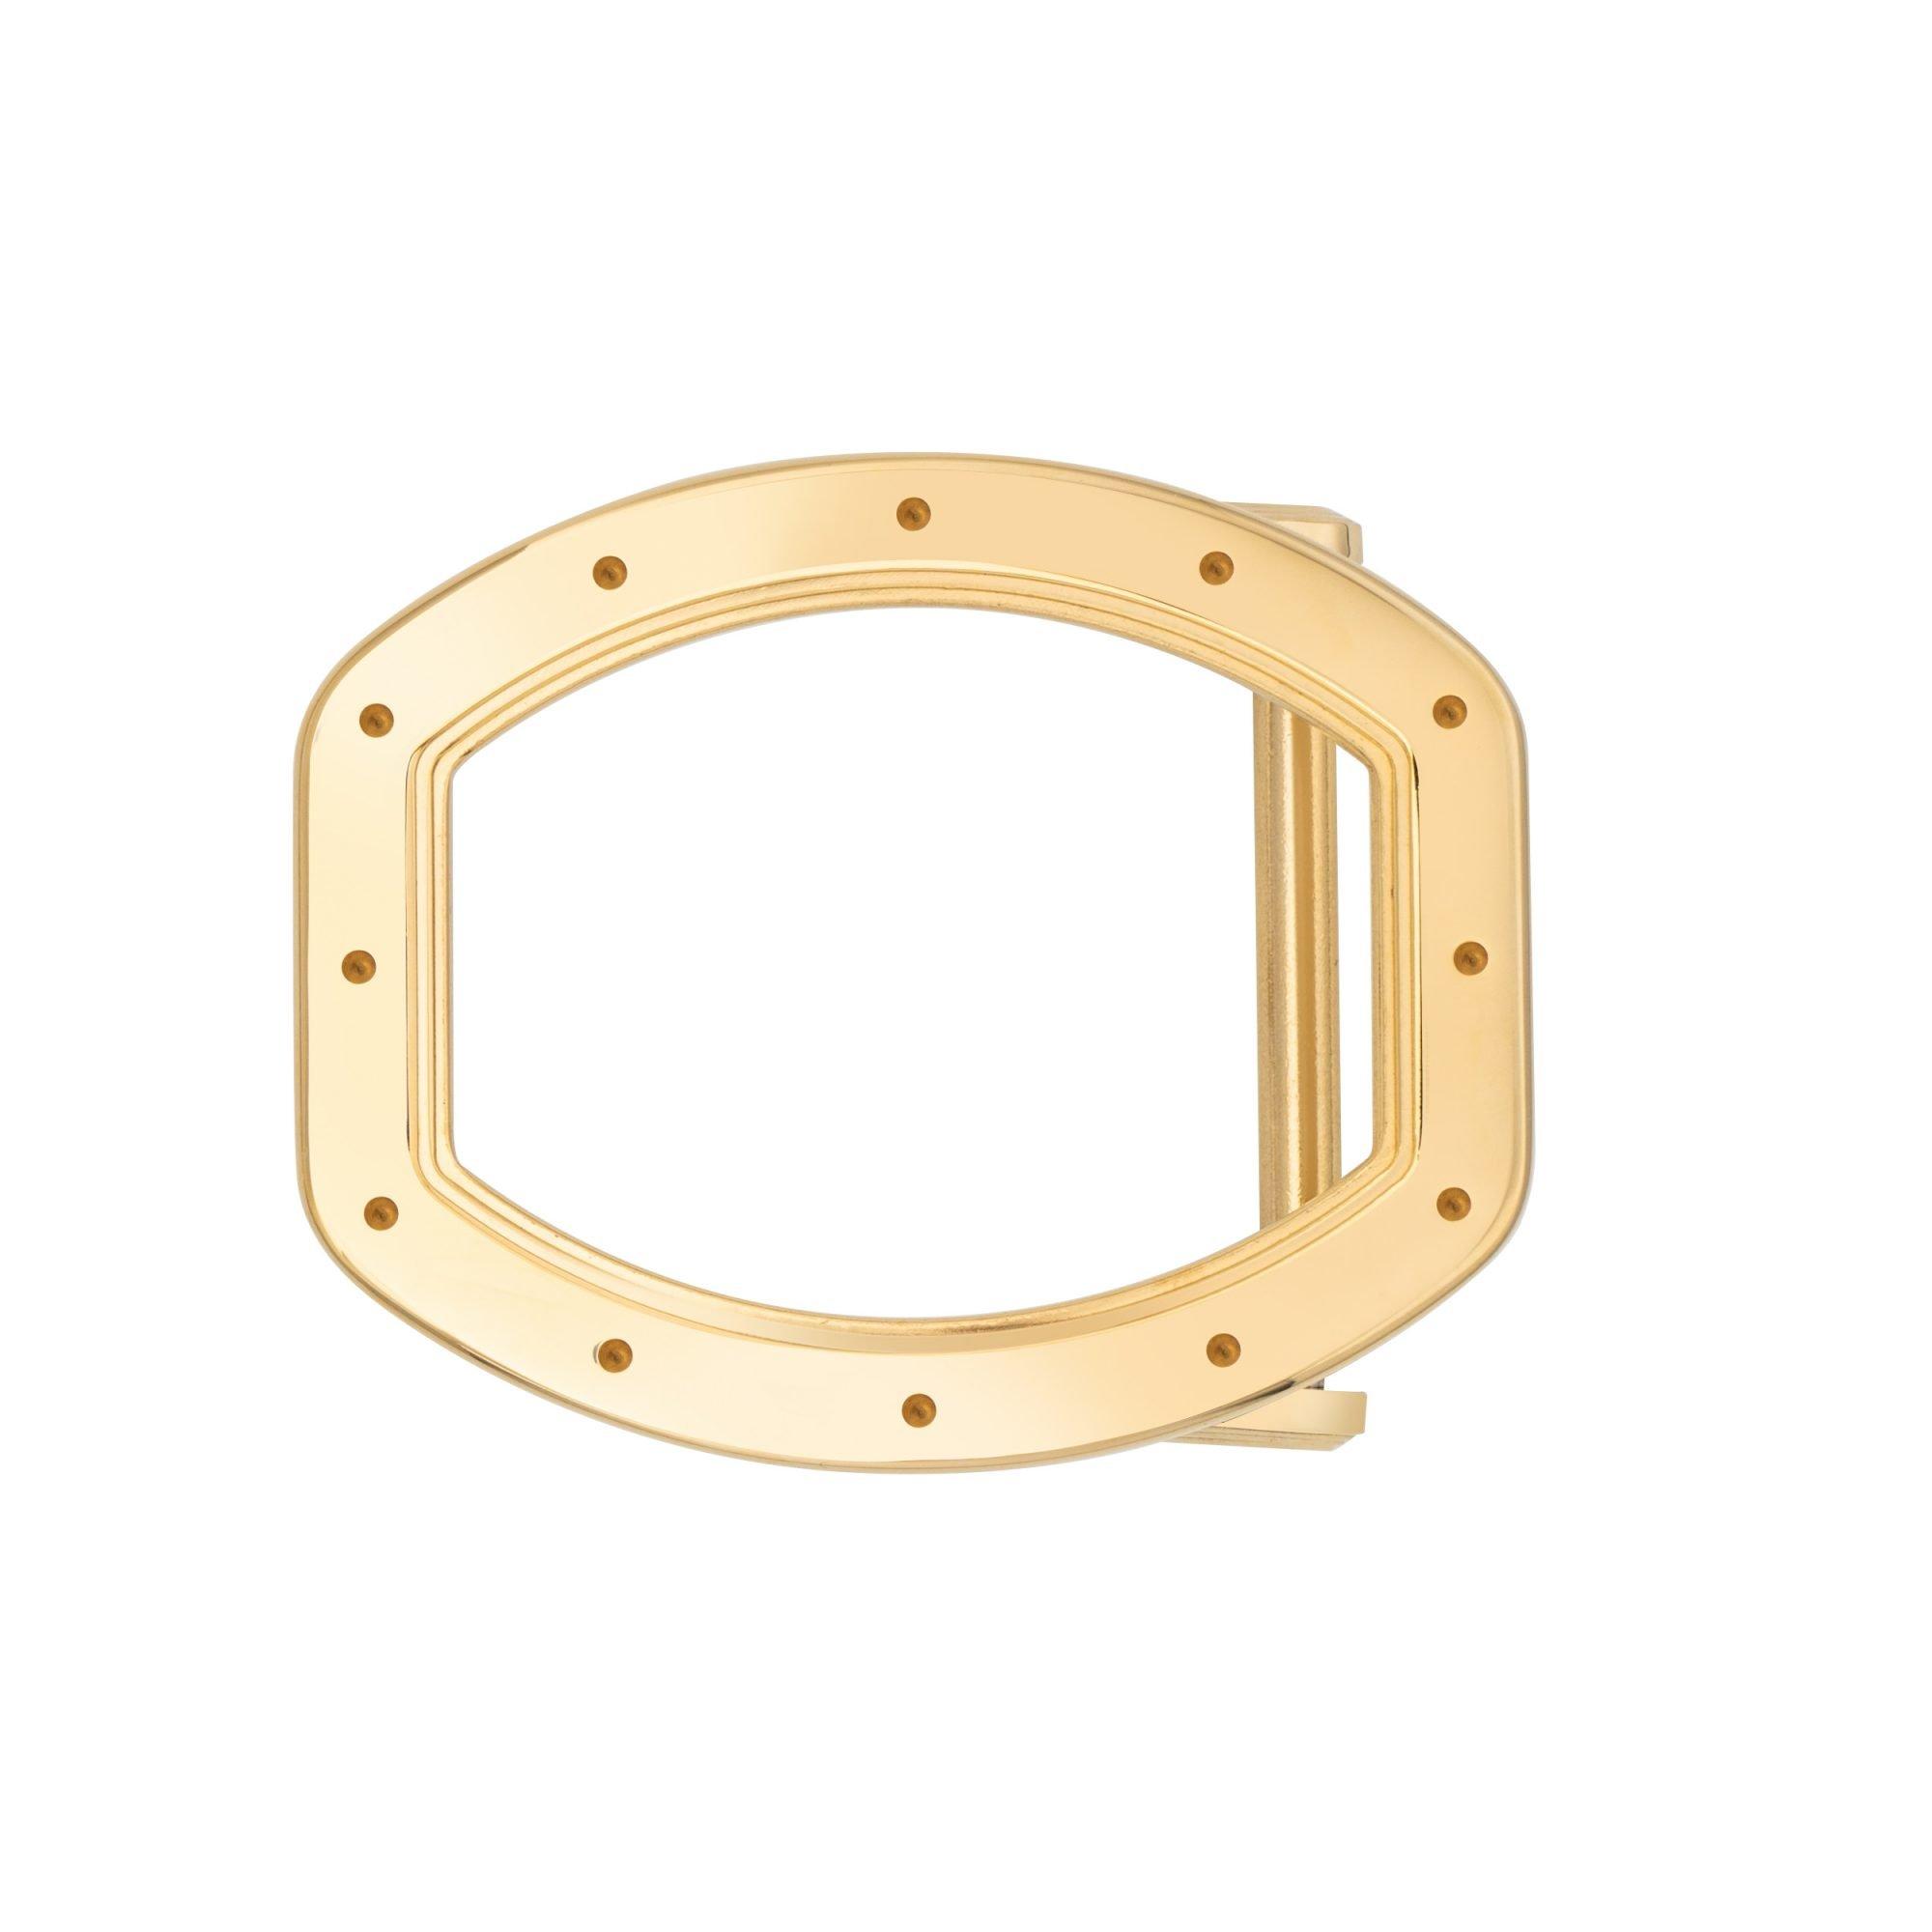 VIKTOR ALEXANDER 38MM STAINLESS STEEL BELT BUCKLE TONNEAU SHAPE YELLOW GOLD FRONT PROFILE